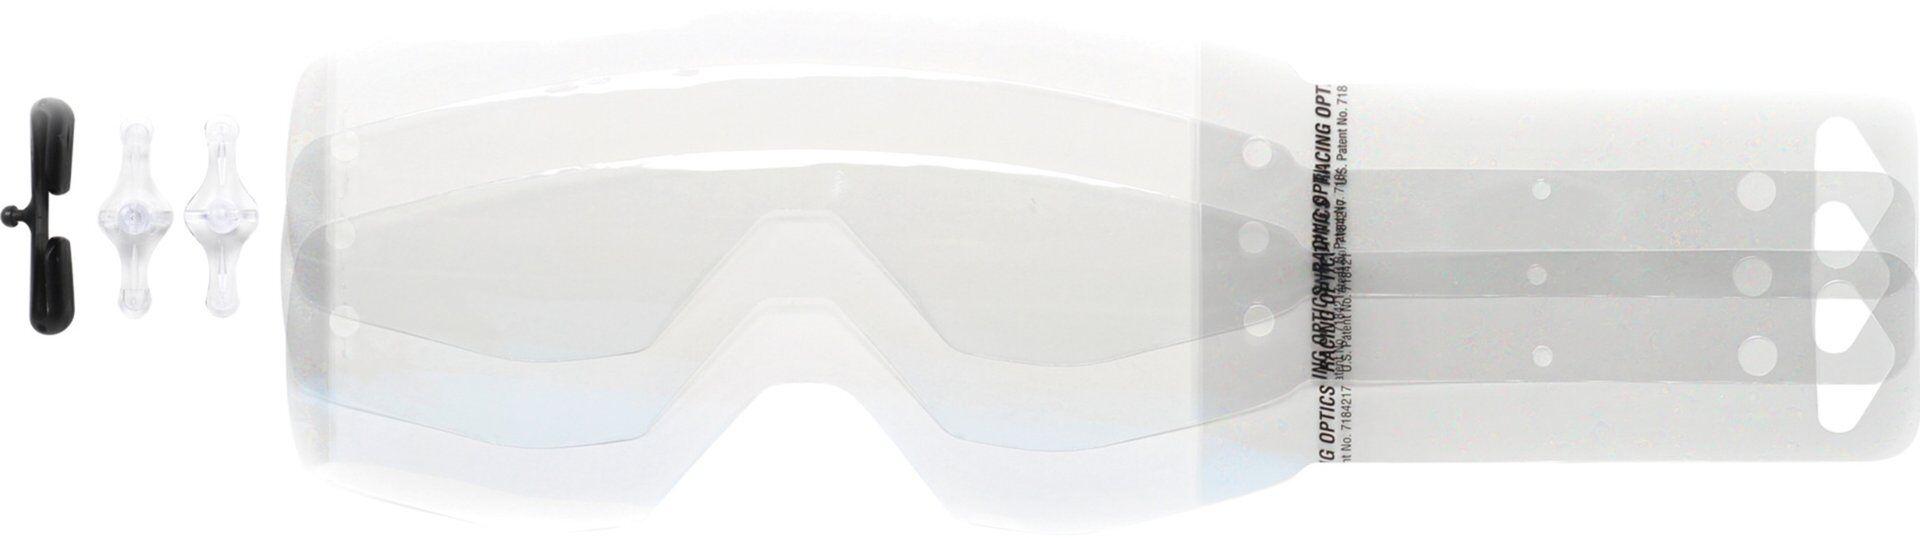 Scott Recoil/Recoil Xi/80S Pro Stack Tear Off 2 Pack Tear off